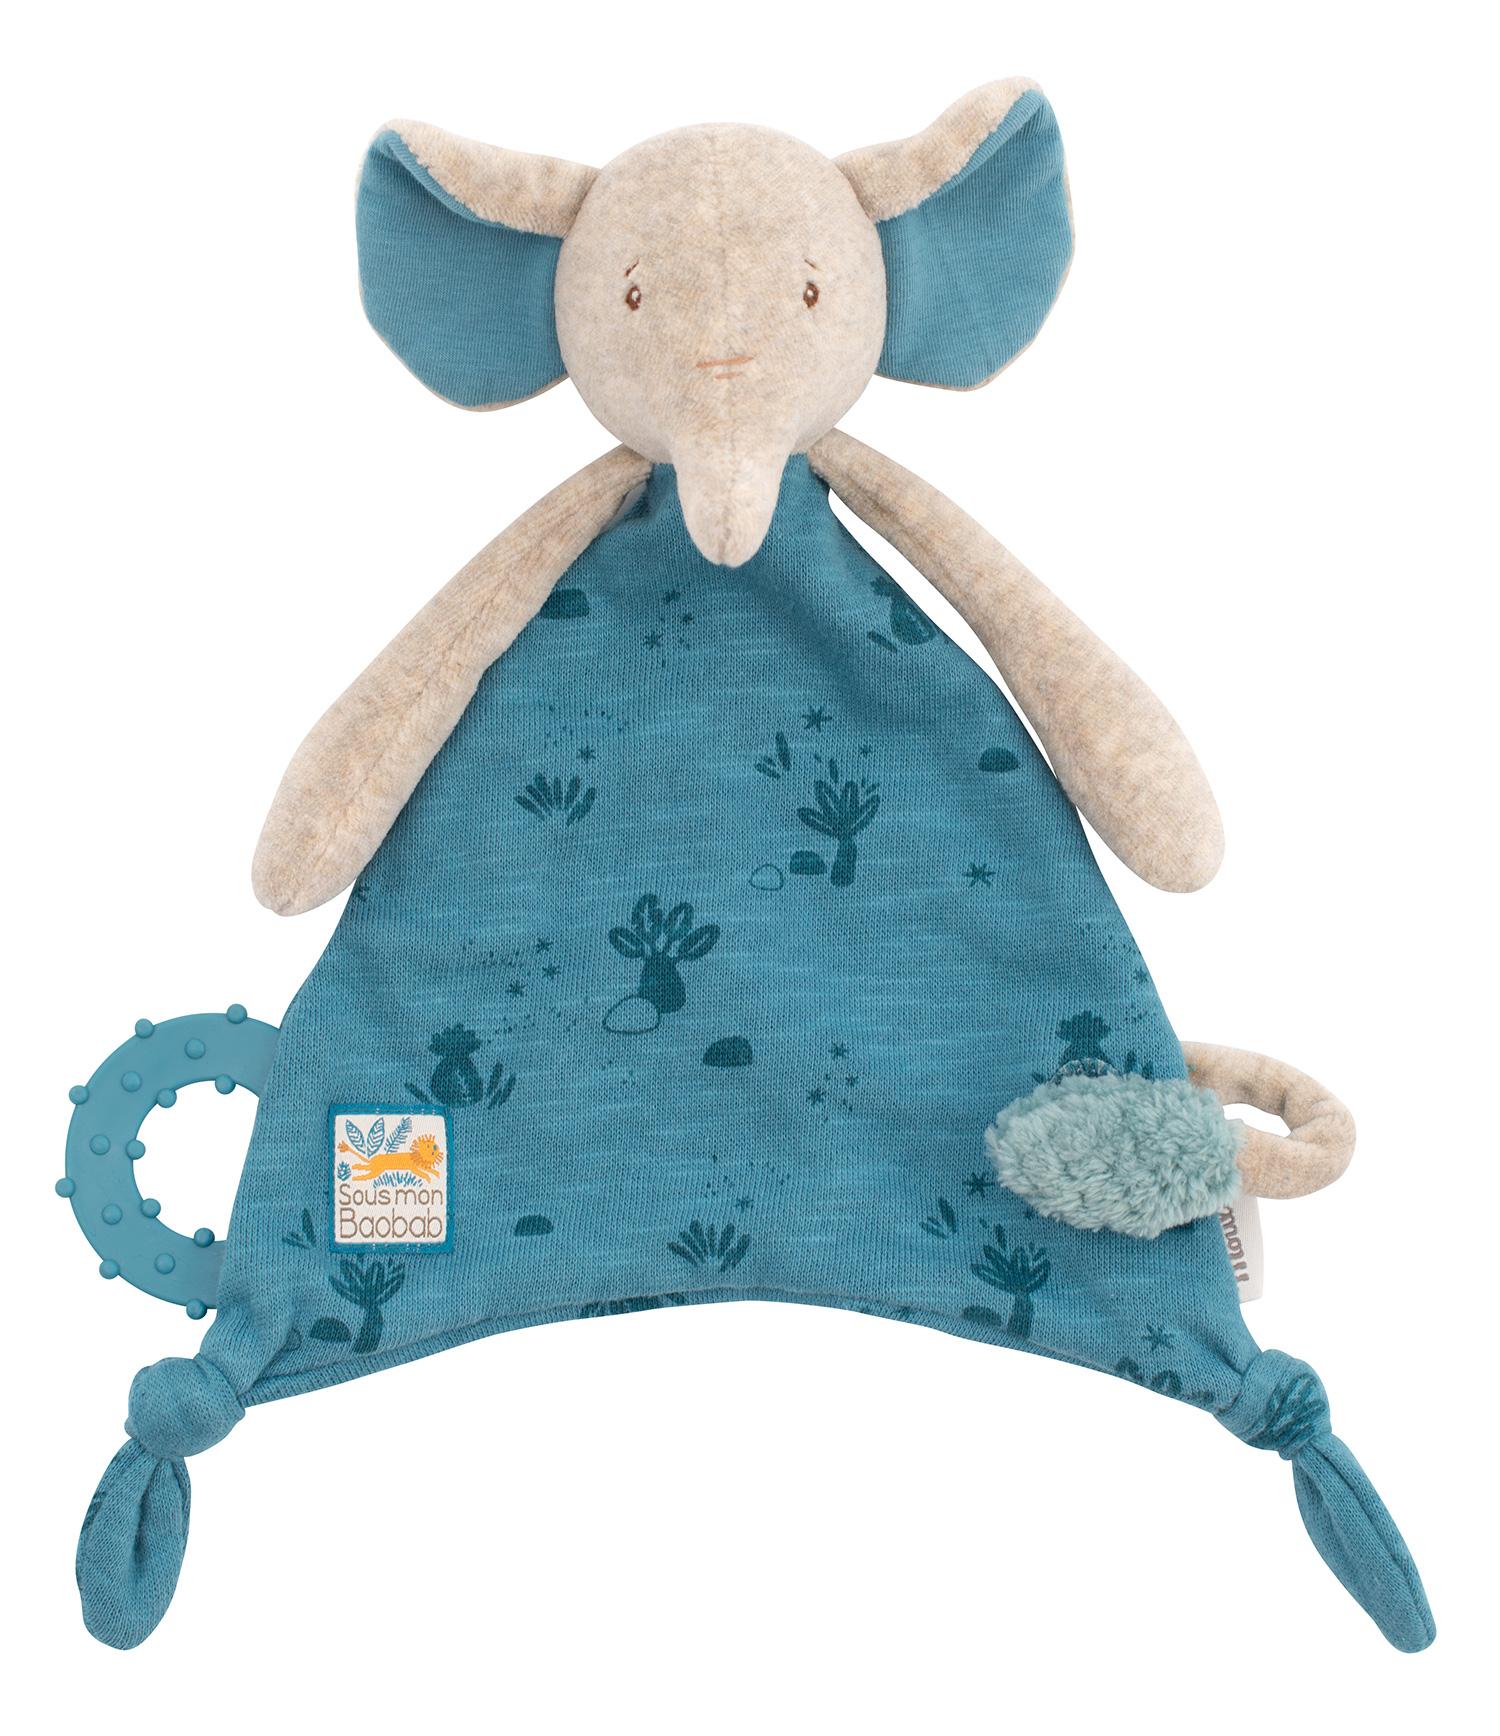 Doudou Elefante di Moulin Roty